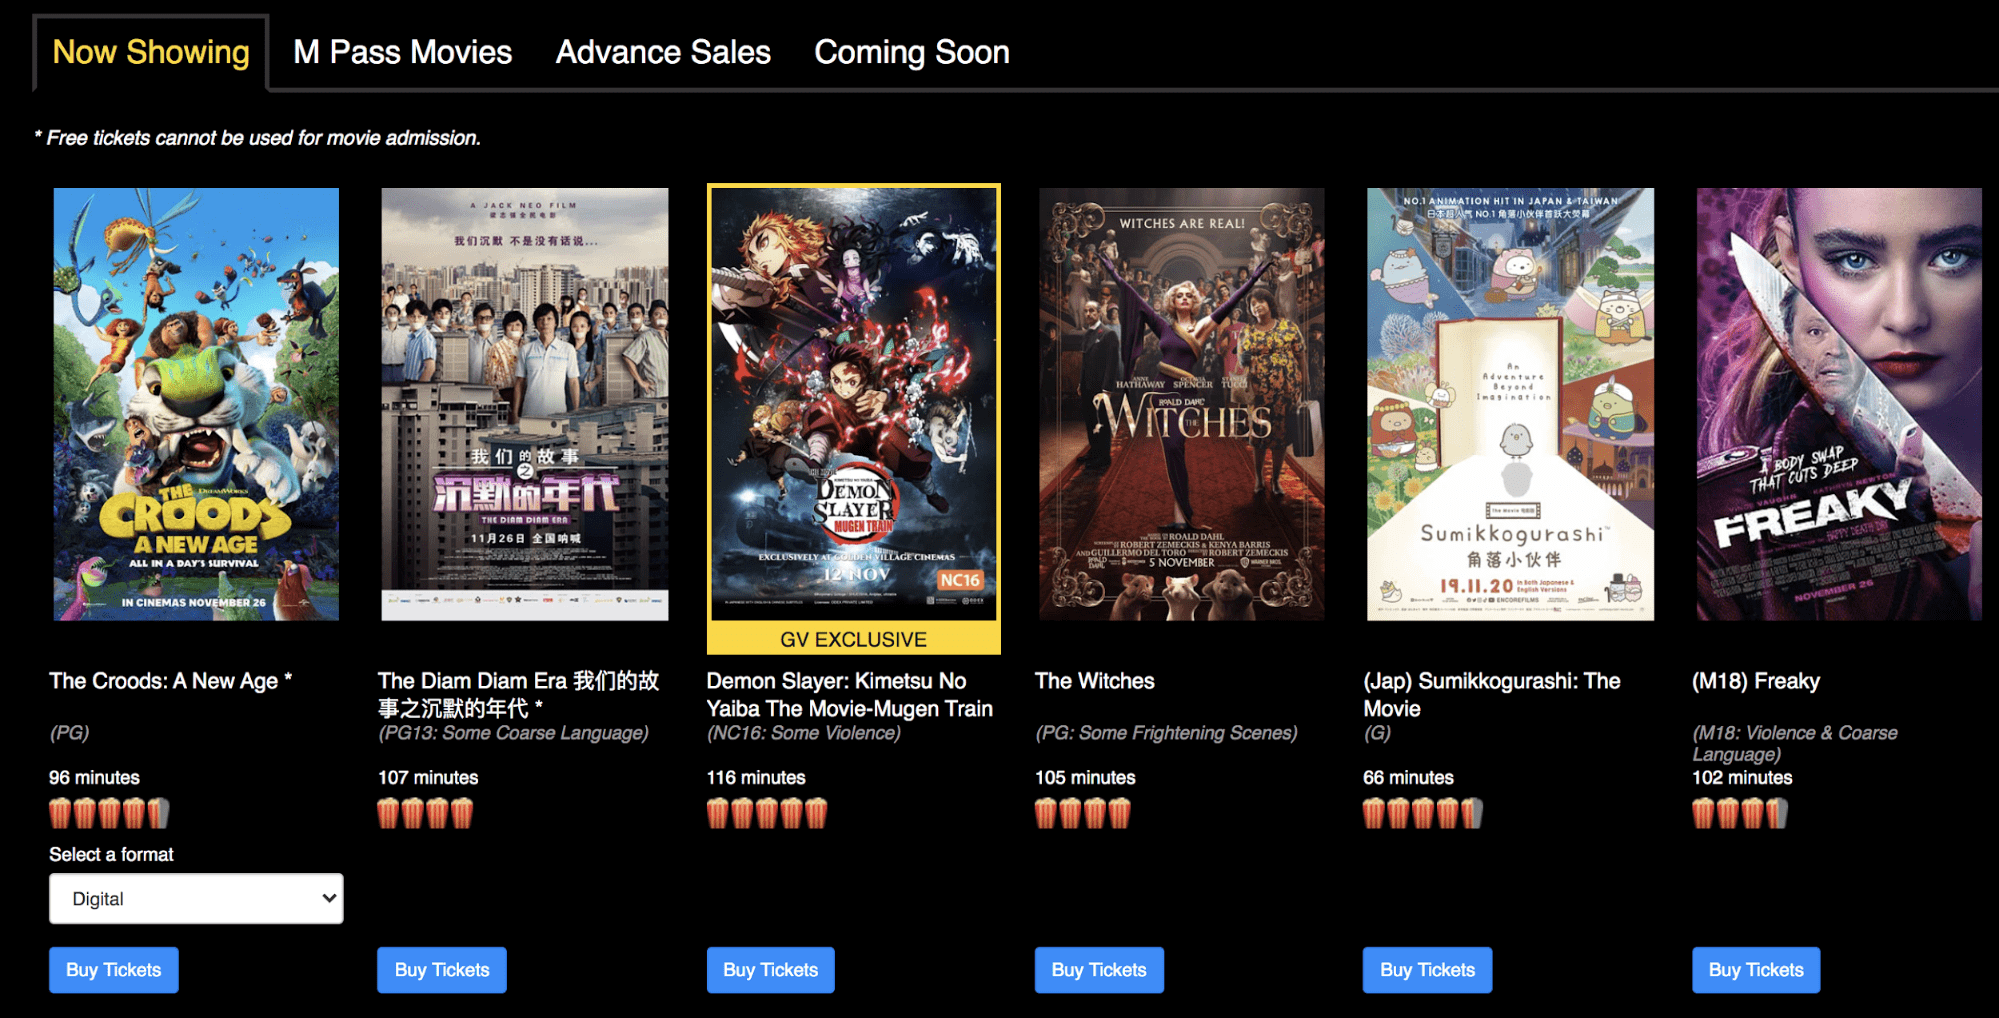 golden village exclusive movies